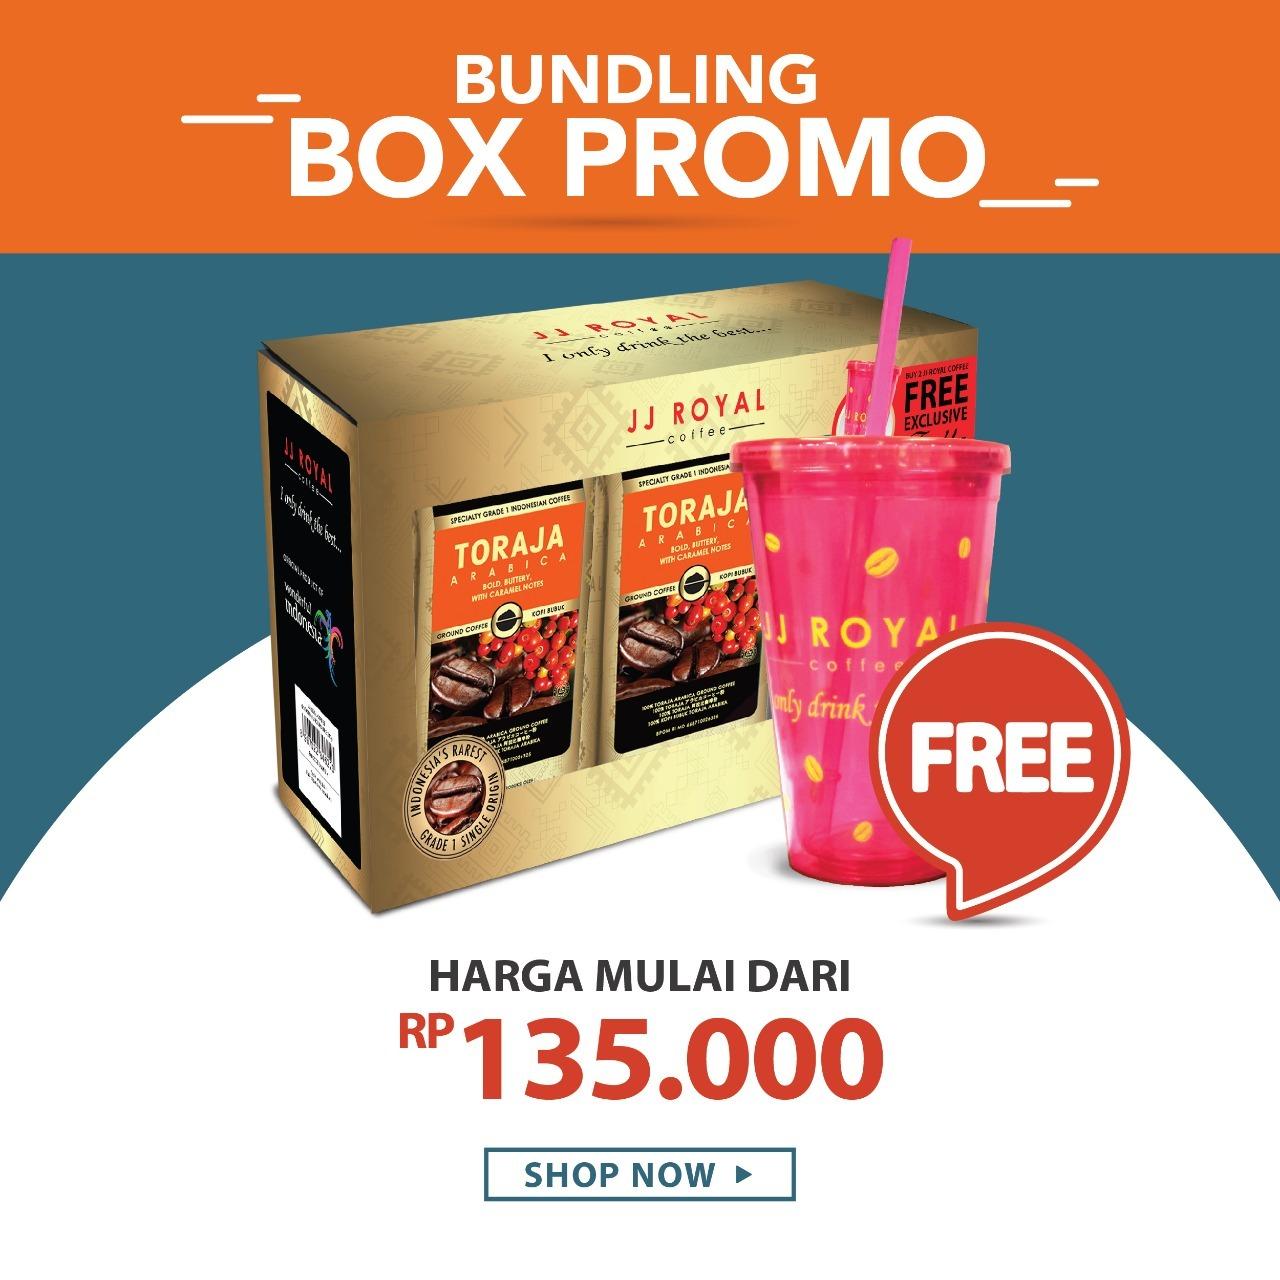 Jj Royal Coffee Toraja Arabica Beans Kopi Biji 200gr Daftar Harga Ground Bag 100g Bundling Box Discount 10 Java Estate Get Tumbler